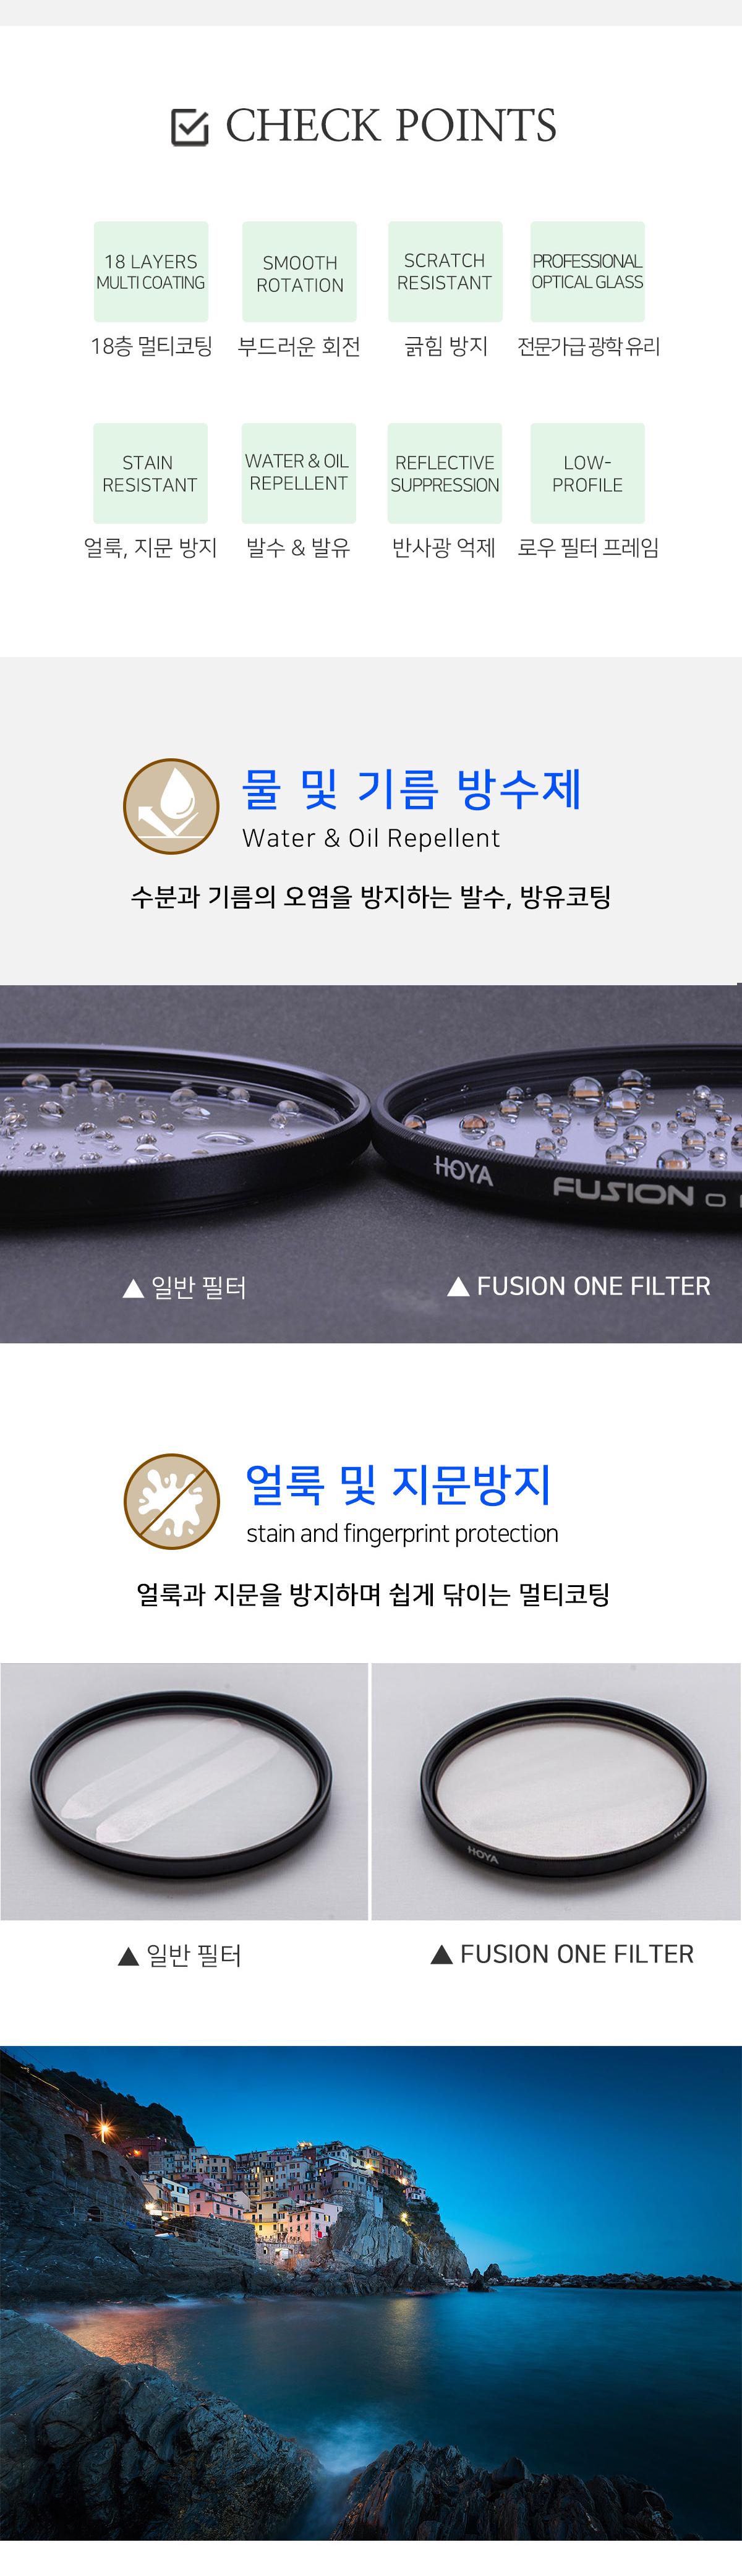 Fusion_One_CPL_02.jpg